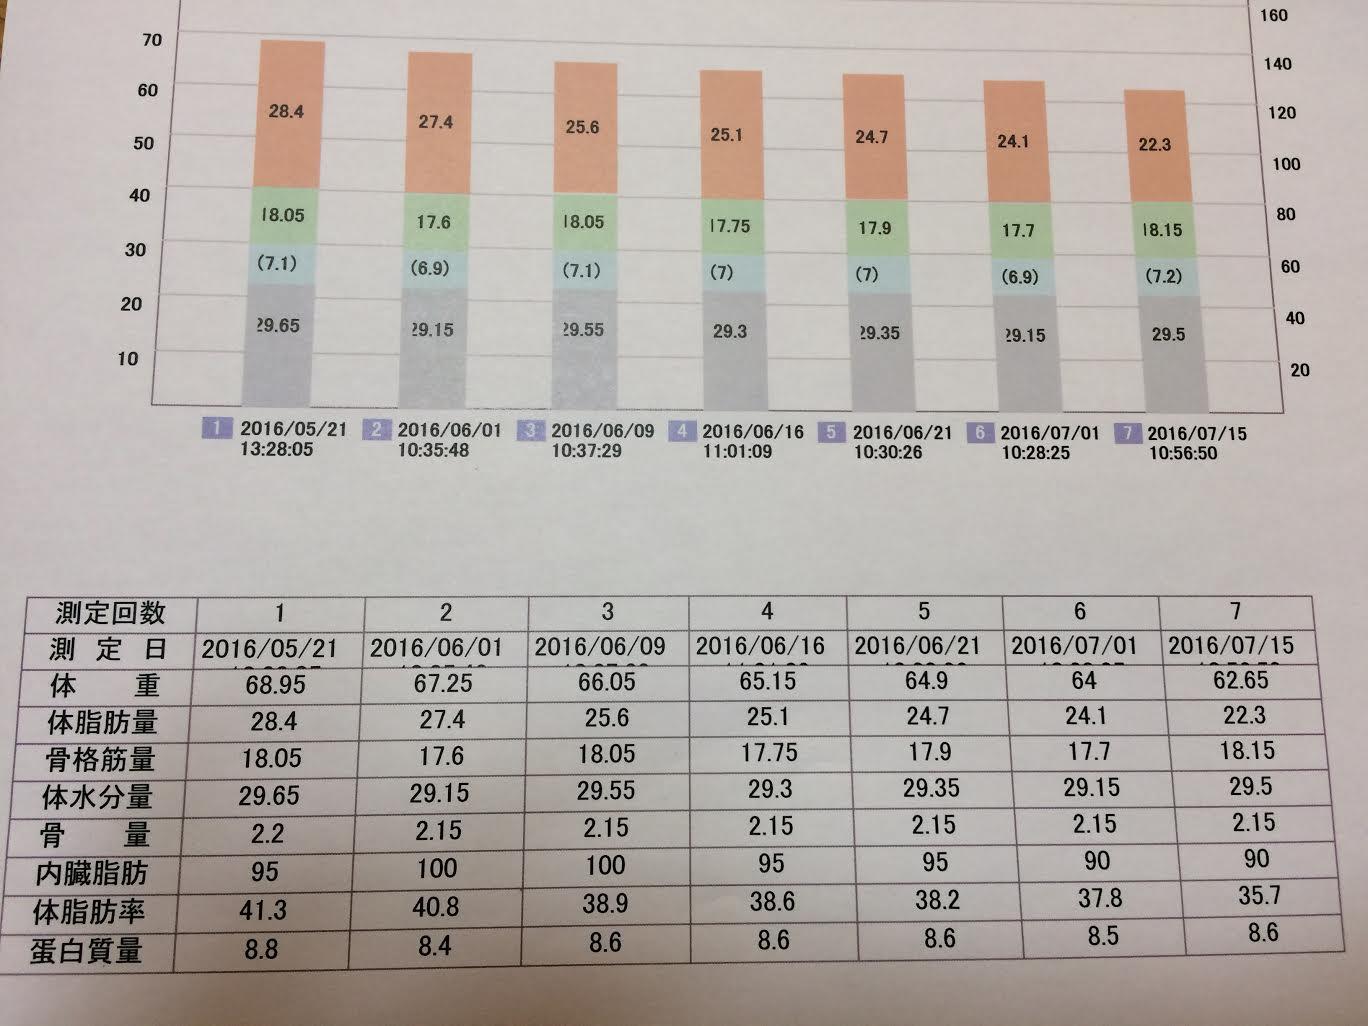 %e7%80%a7%e5%8f%a3%e3%81%95%e3%82%93%e3%82%b9%e3%82%bf%e3%83%bc%e3%83%88%e6%99%82%e3%81%ae%e3%82%b0%e3%83%a9%e3%83%95%e8%a1%a8